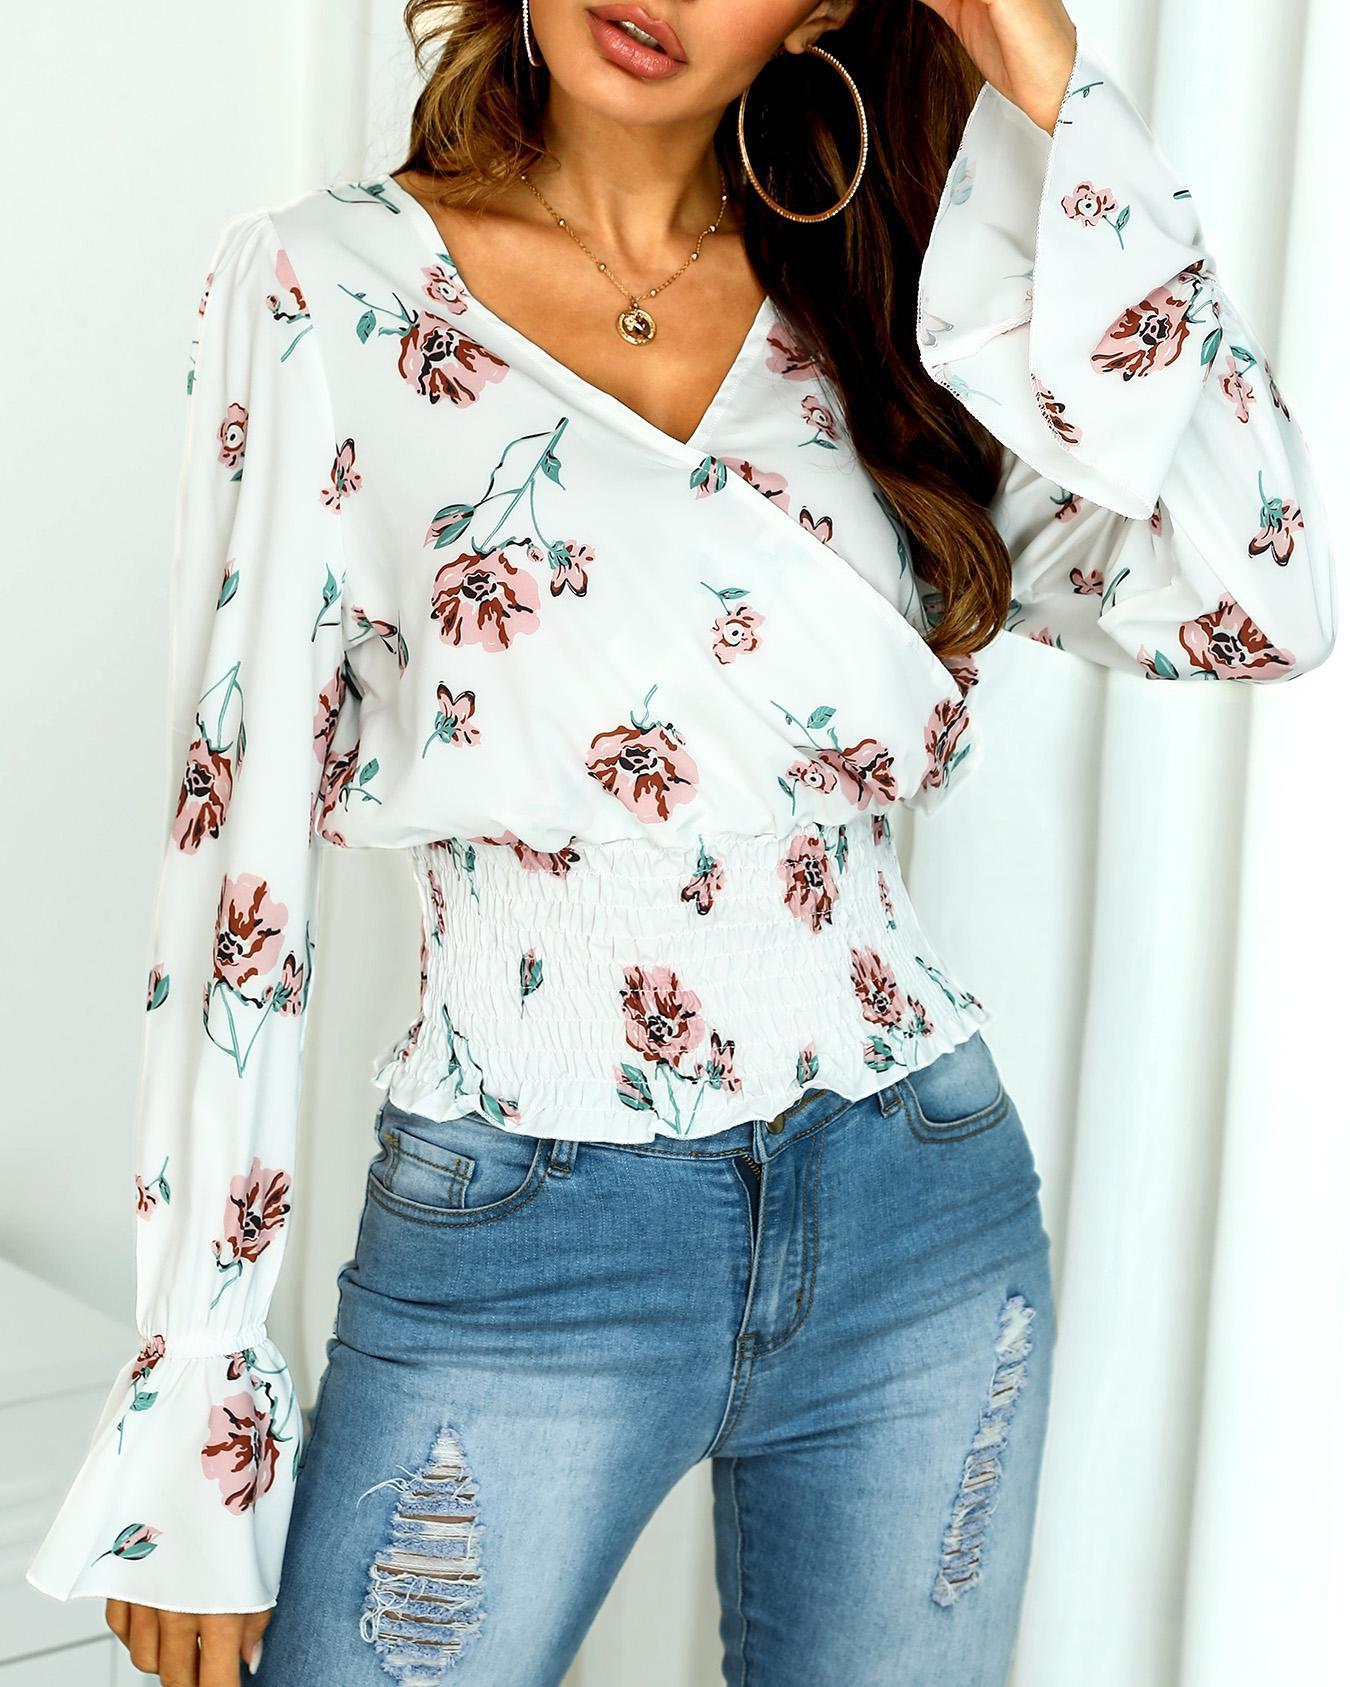 boutiquefeel / Blusa de envoltório de manga comprida floral